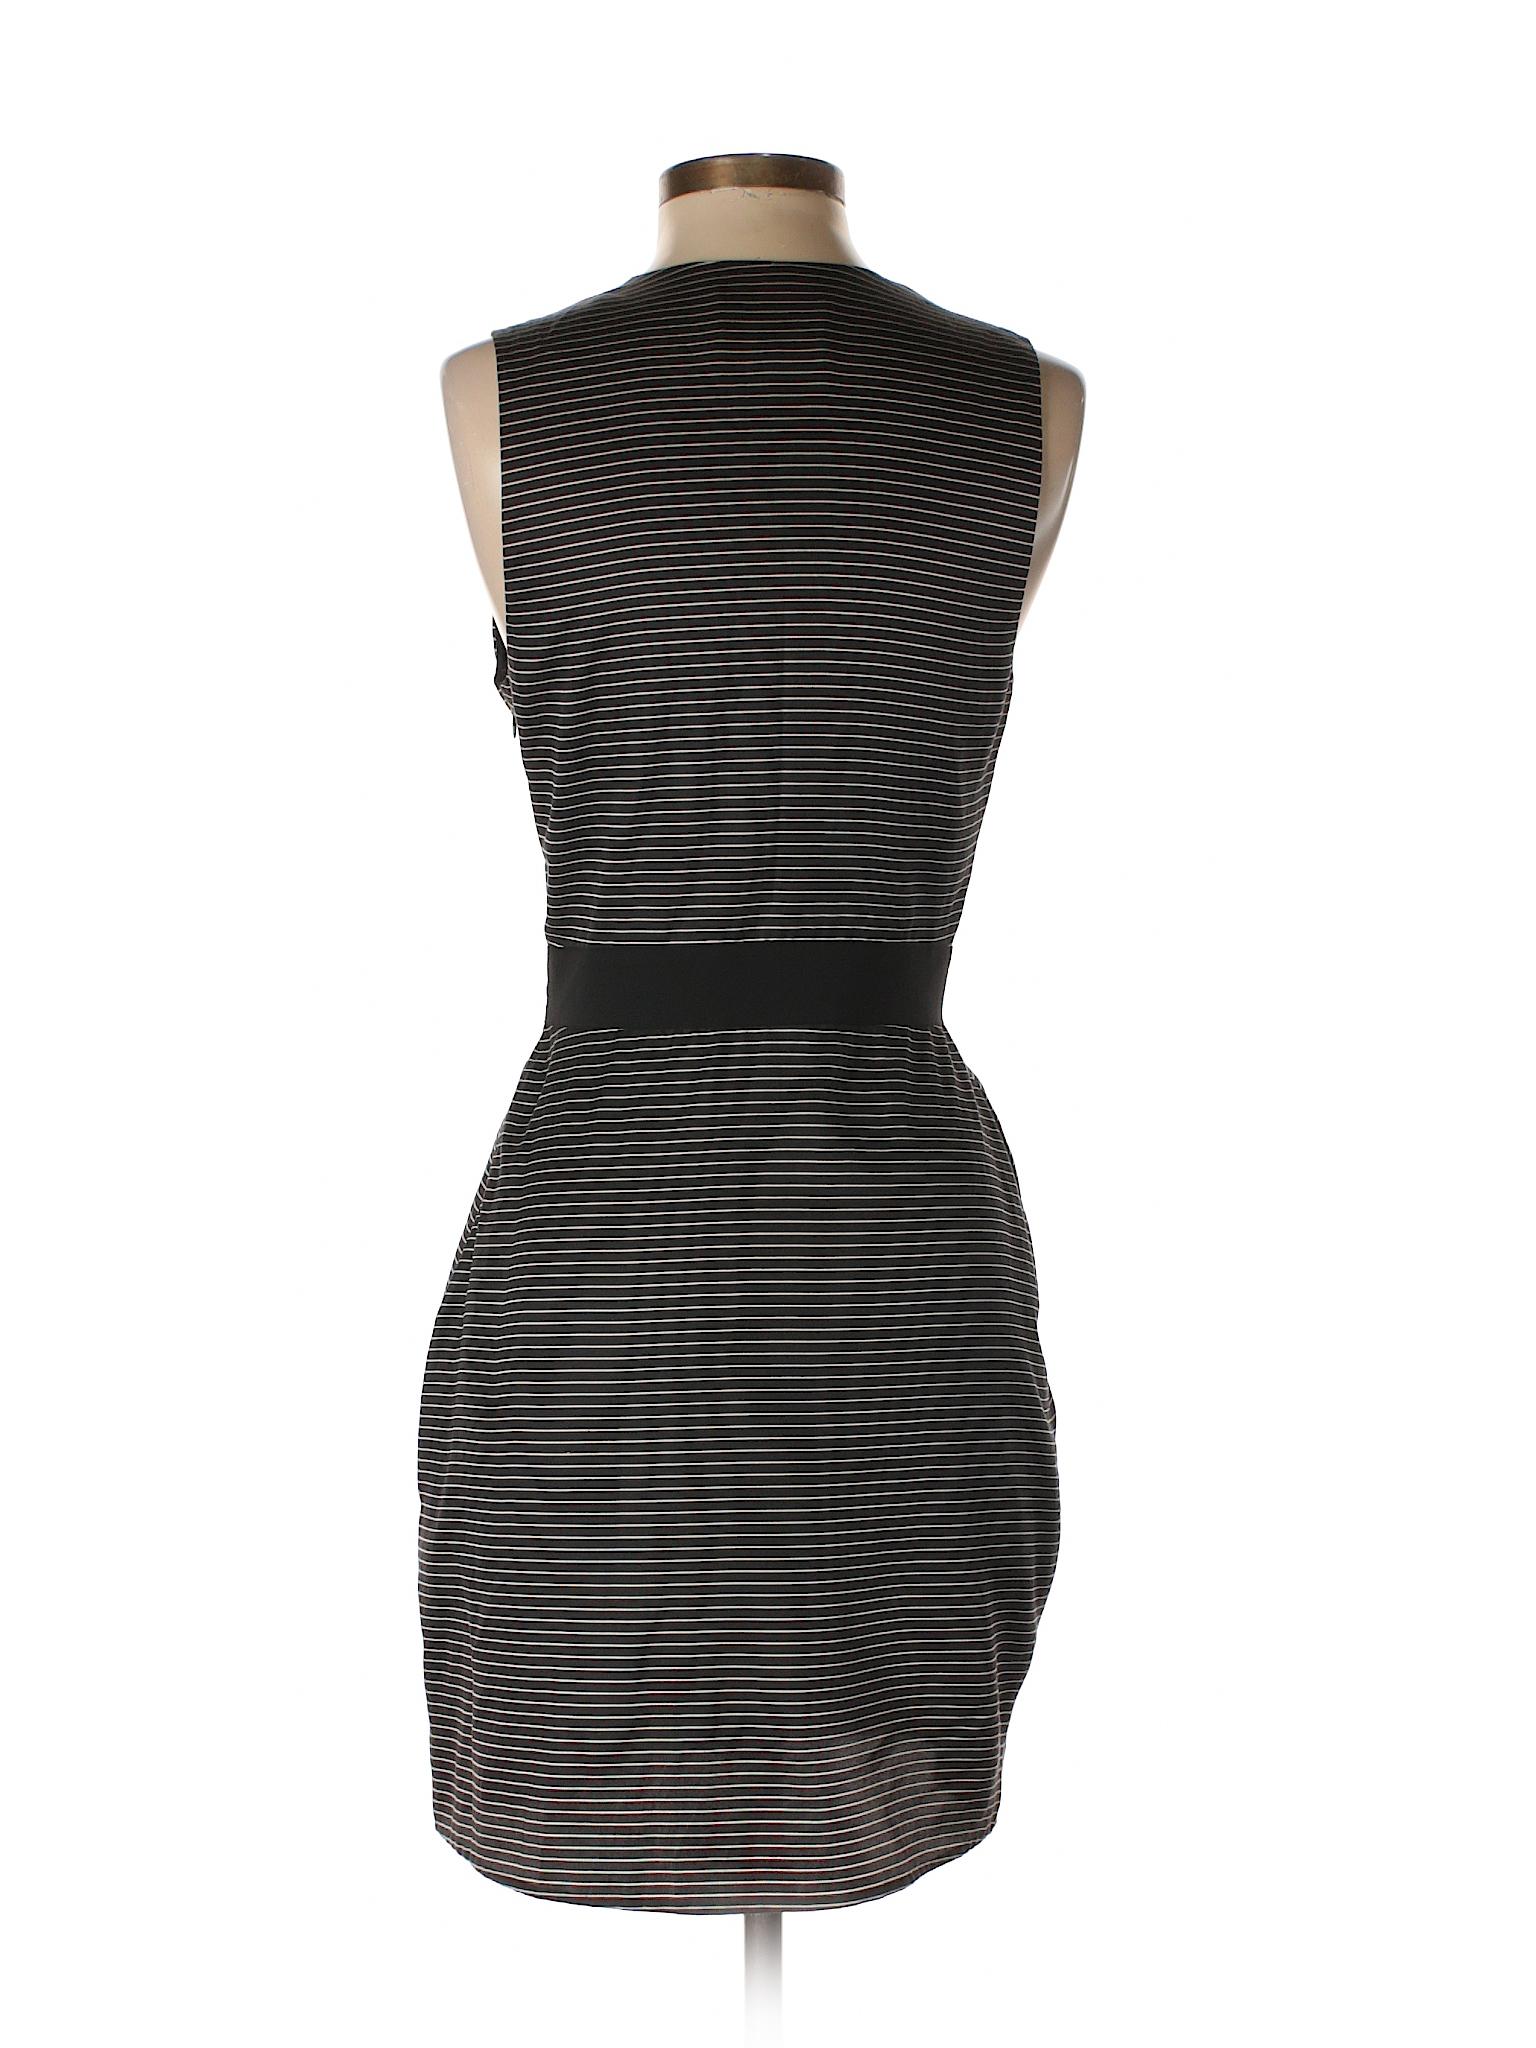 Casual 3 winter Lim Dress Phillip 1 Boutique X1xwgX